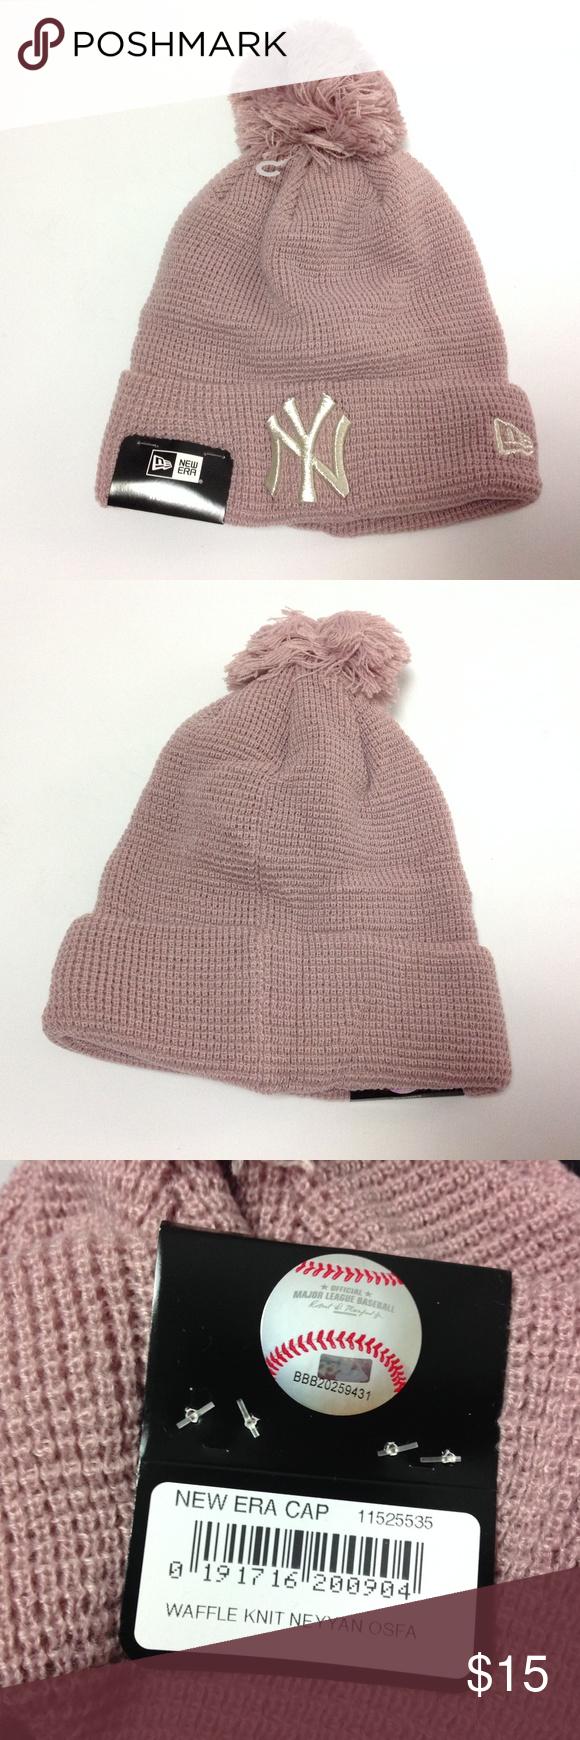 8cc927f2dac Newyork Yankees Womens Winter Beanie Hat E13 New Era Women s Winter Cap  Waffle Knit Newyork Yankees Pink One Size New EP New Era Accessories Hats